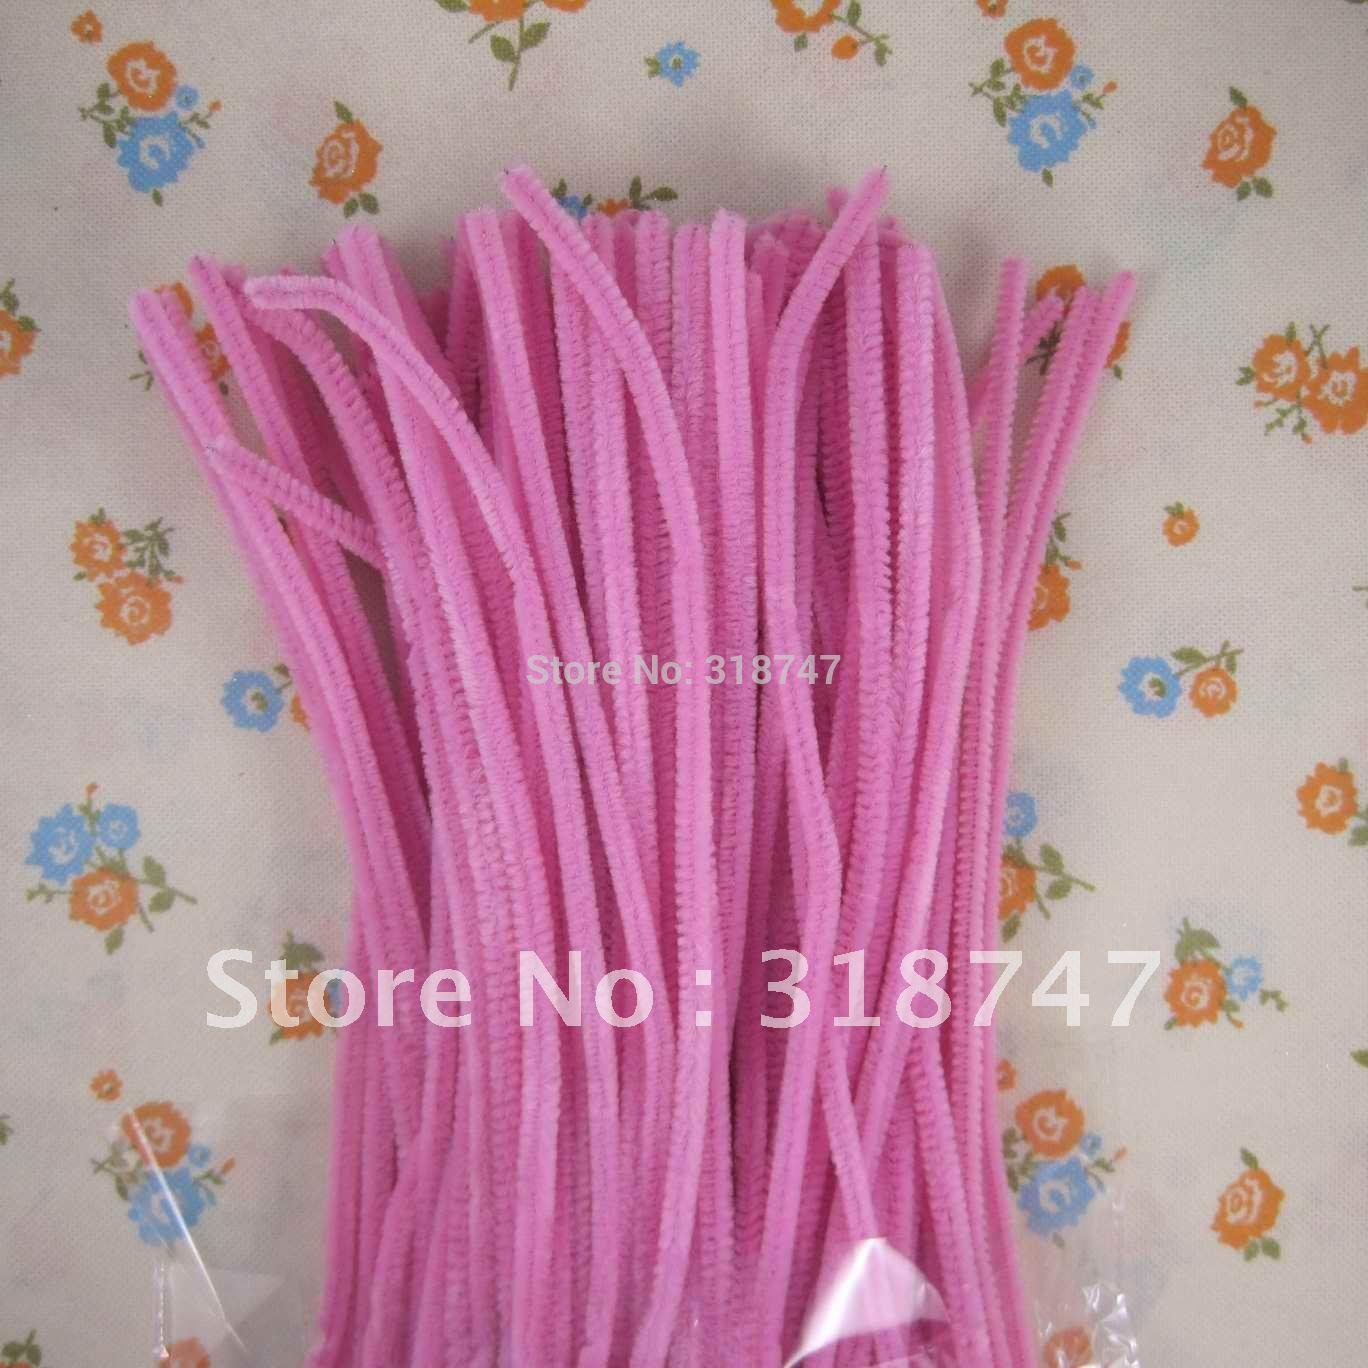 50pcs/pack pink Chenille Stems Pipe Cleaners Handmade Diy Art &Craft Material kids Creativity handicraft toys(China (Mainland))